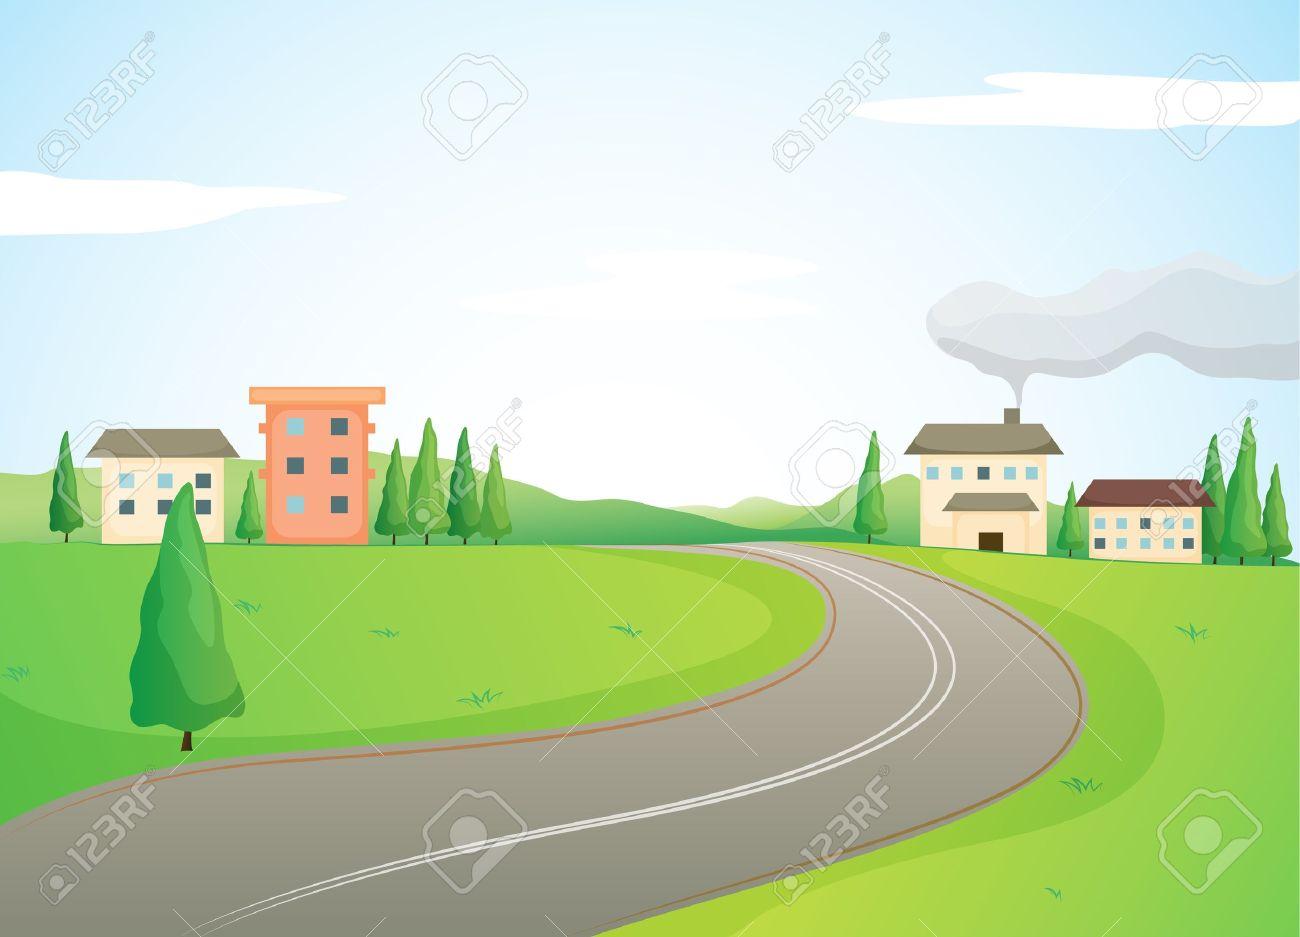 Nature road clipart.